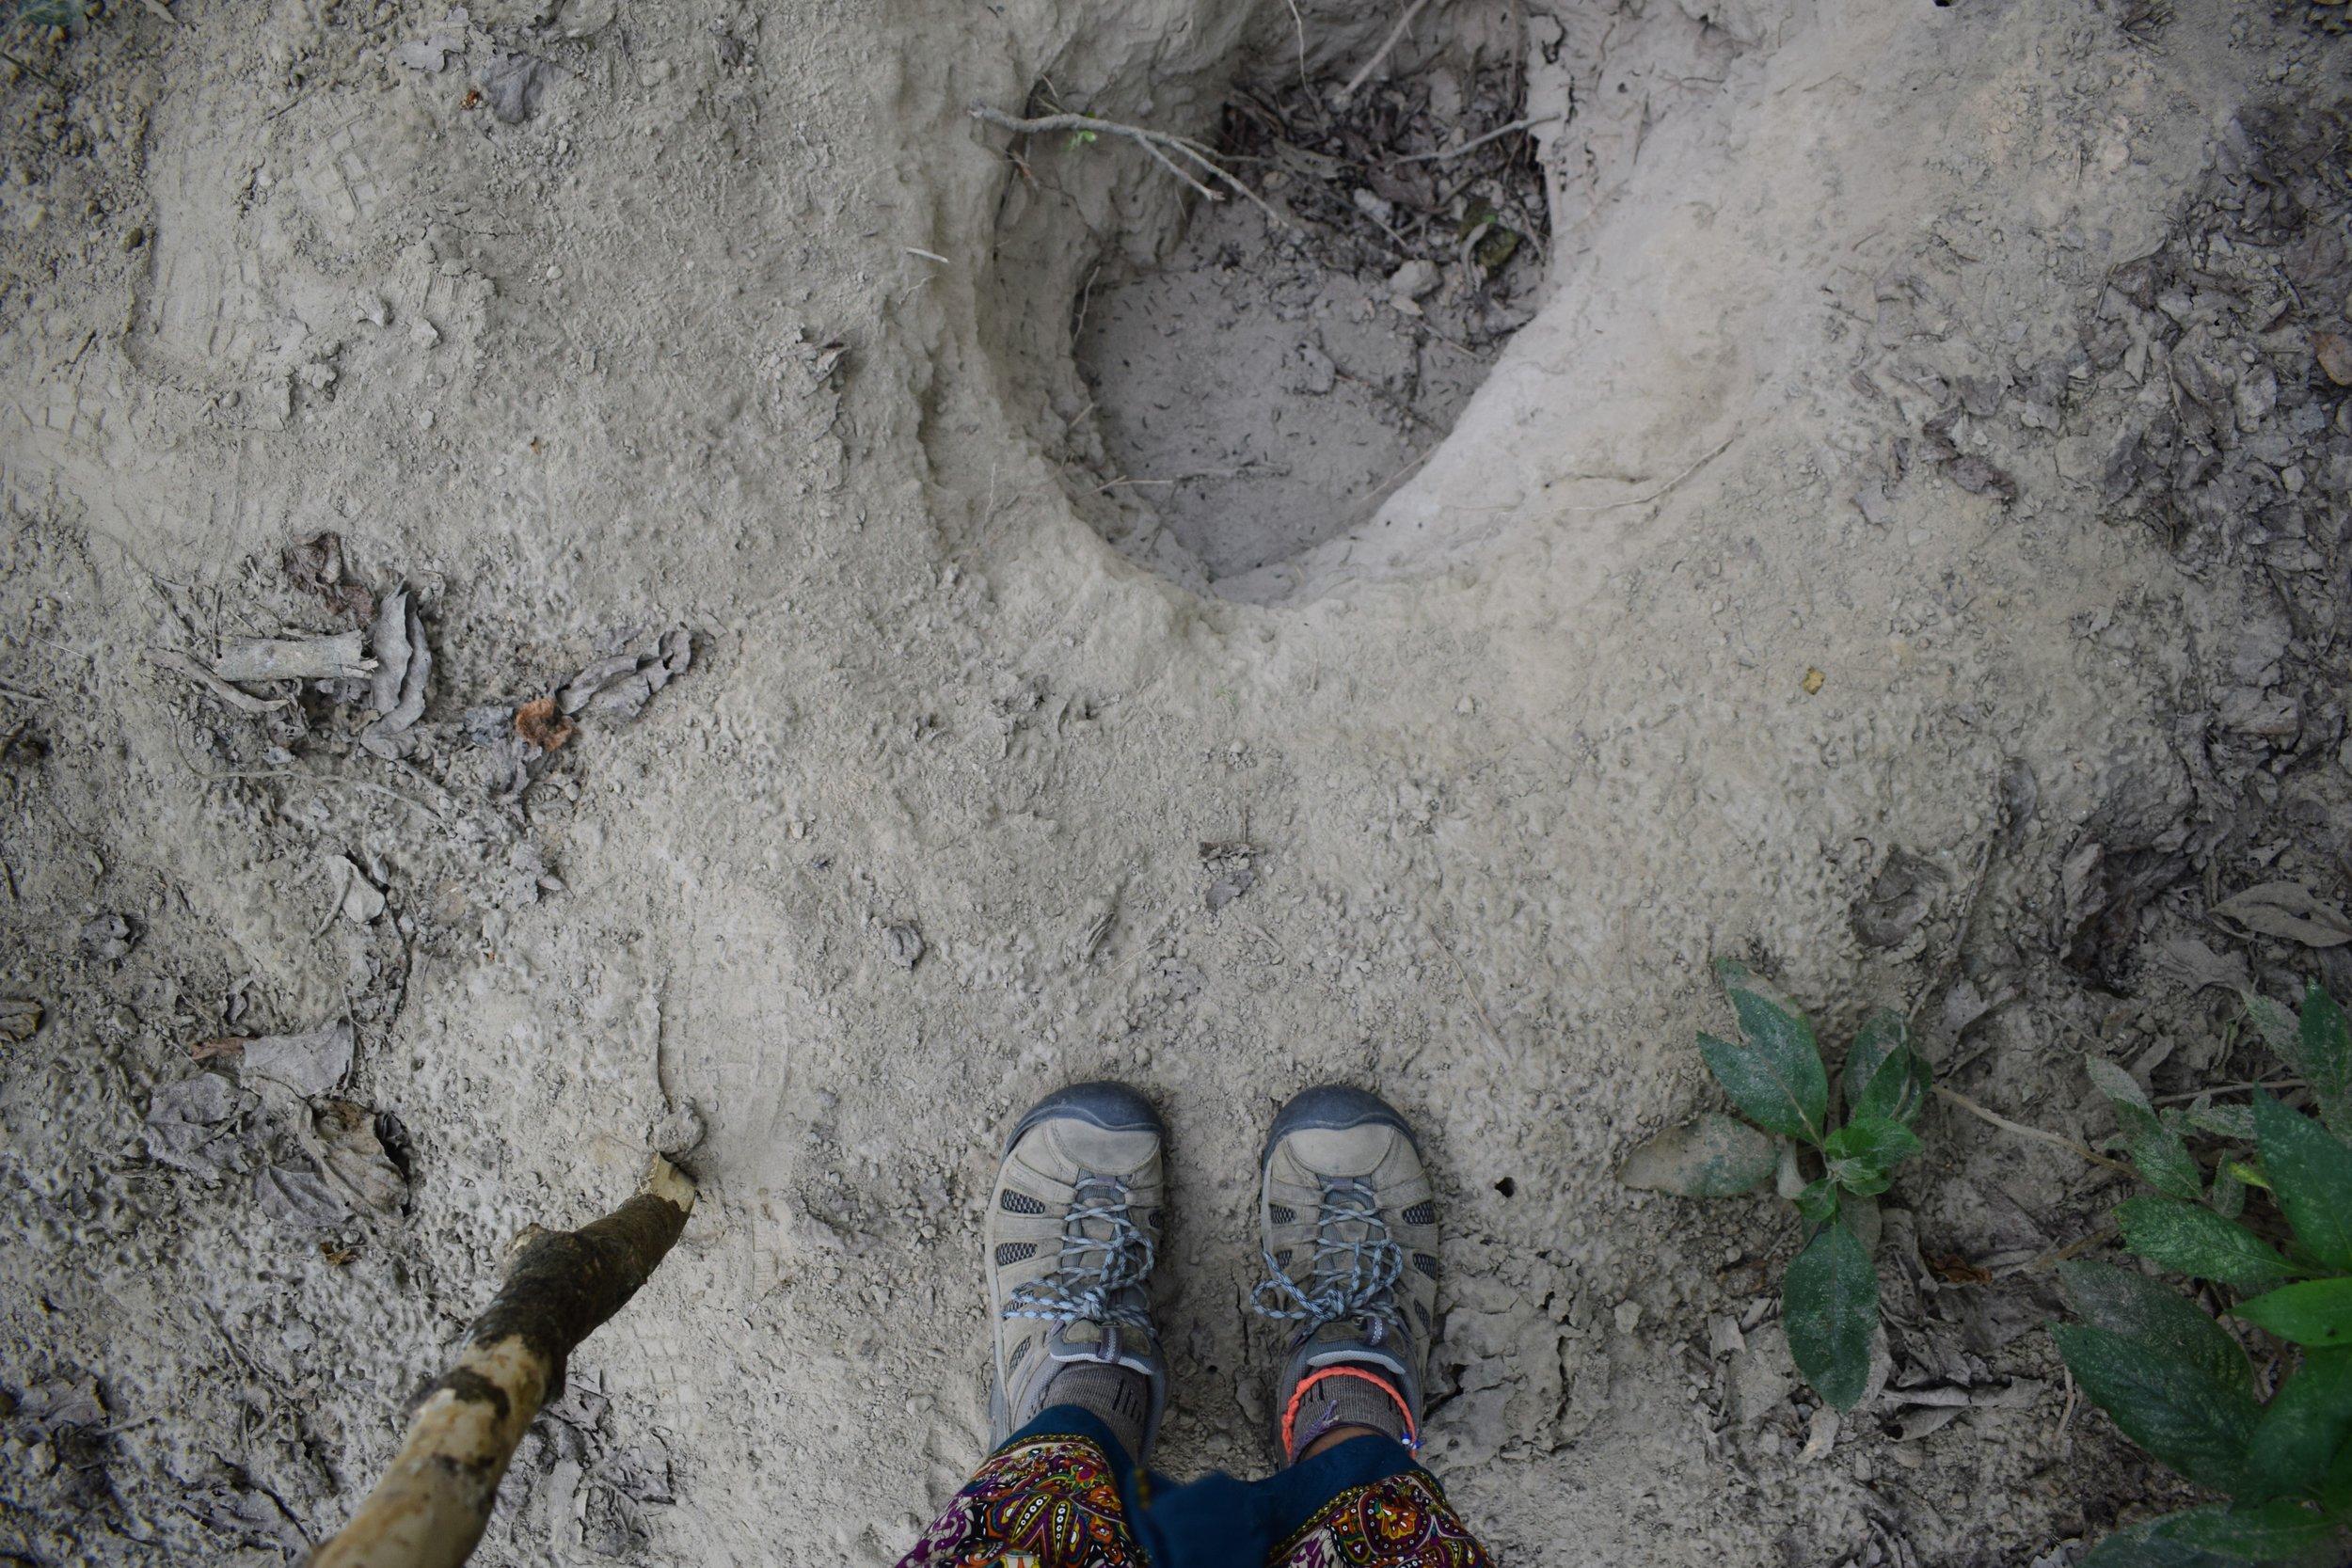 A hole dug by a sloth bear seeking termites